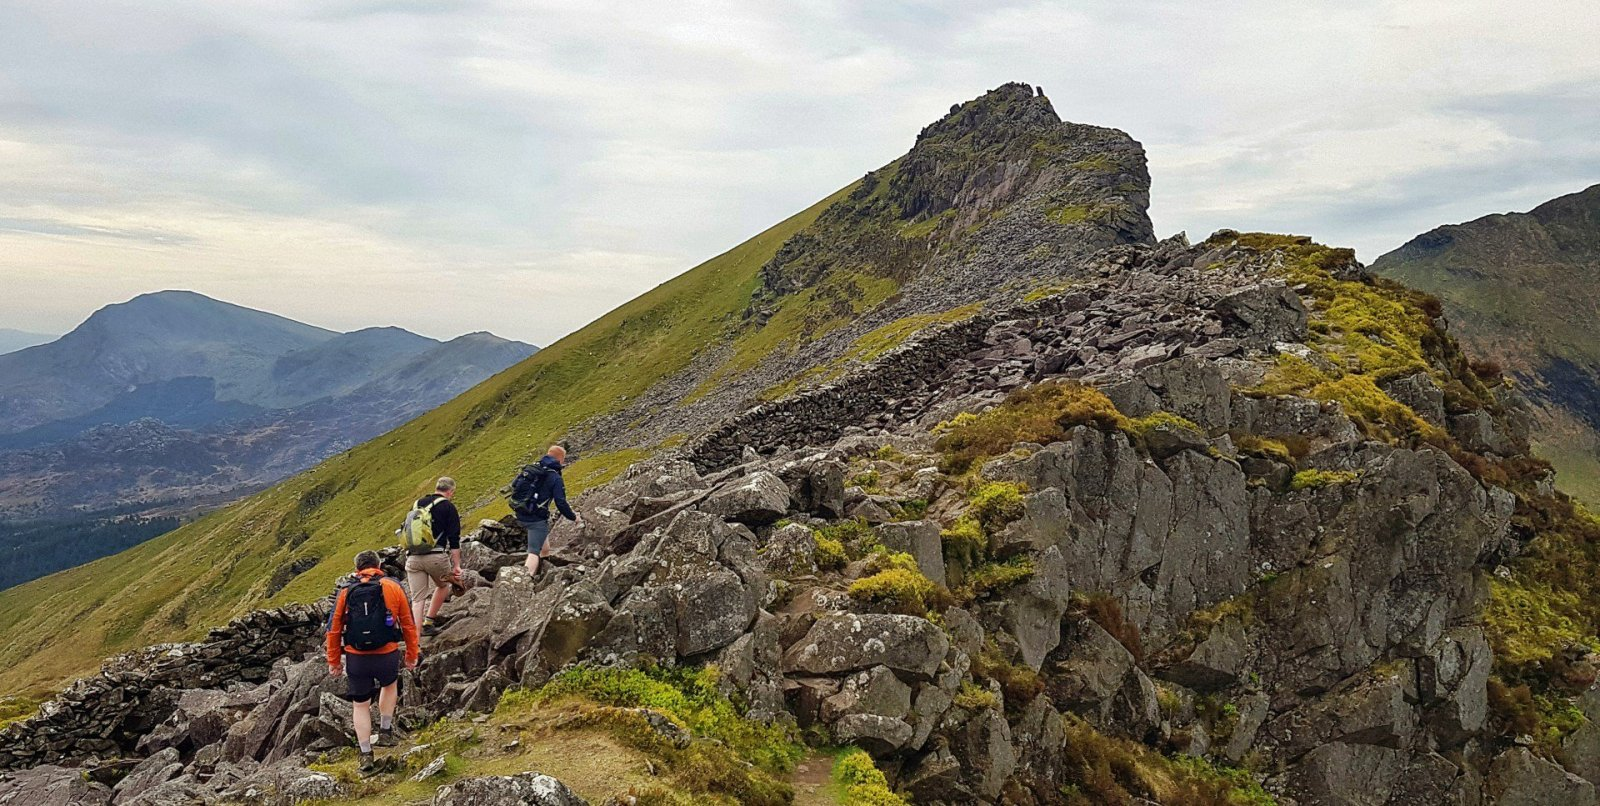 Best Mountain Walks in Snowdonia - Best Walks from the Welsh Highland Railway - Nantlle Ridge